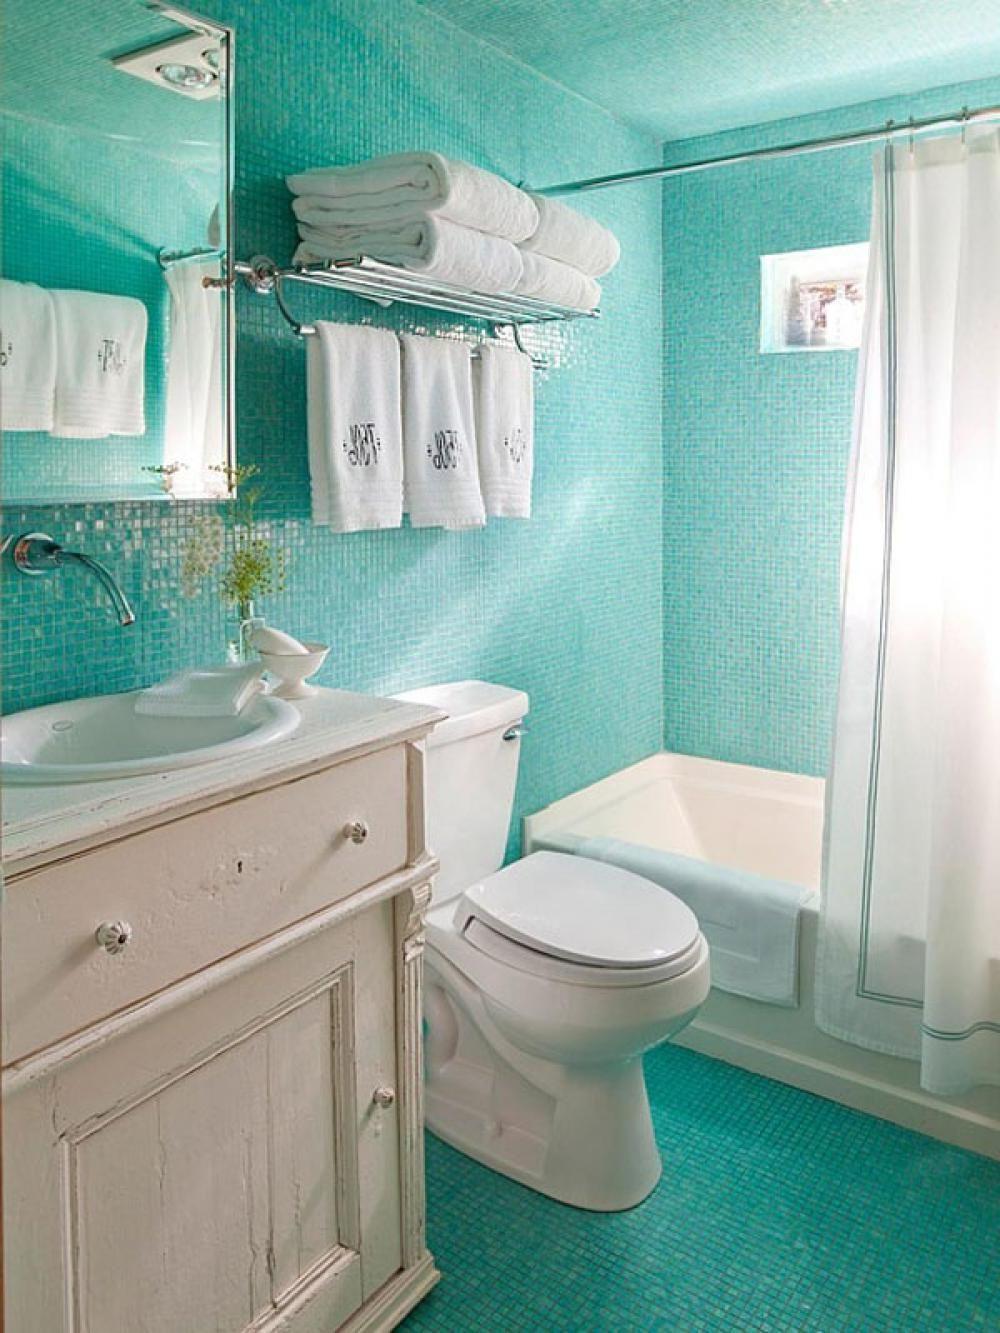 Nice Looking Ocean Themed Bathroom Designs Dazzling Turquoise Mosaic Tiles Ocean Themed Bathroom De Small Apartment Bathroom Turquoise Bathroom Blue Bathroom